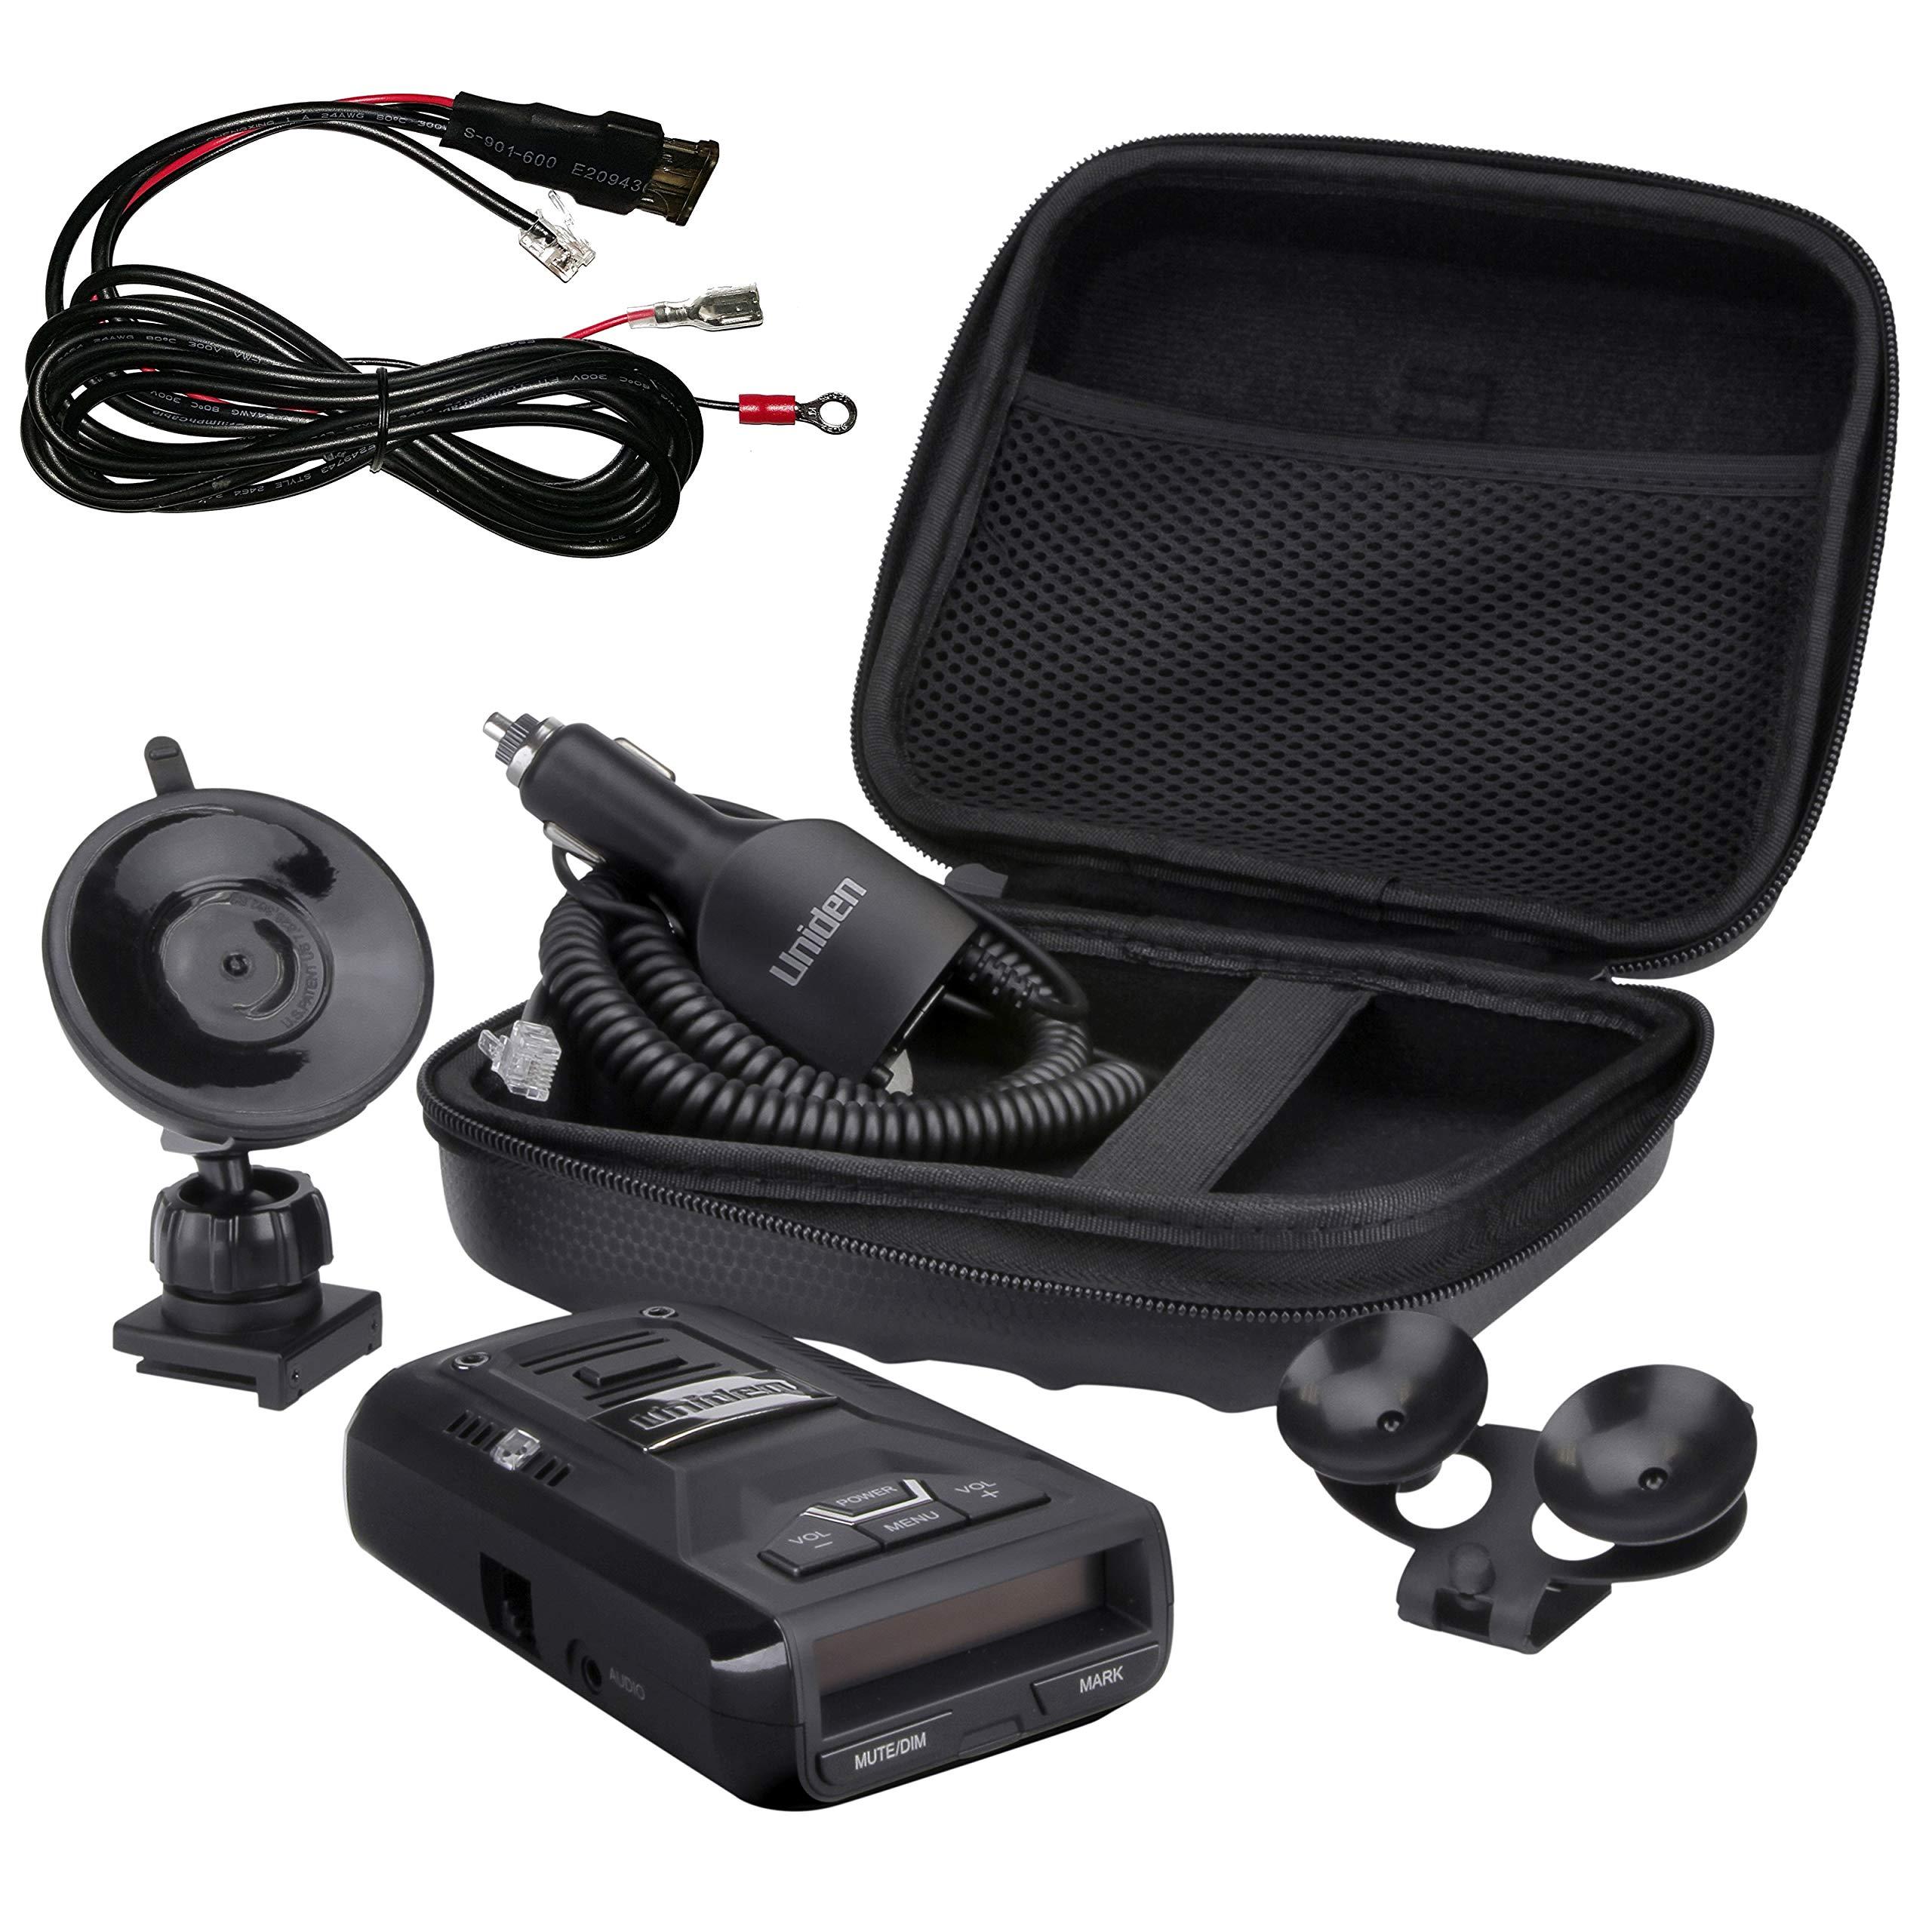 Uniden R3 Extreme Long Range Radar Laser Detector GPS, 360 Degree, DSP, Voice Alert Plus Hard Wire Kit